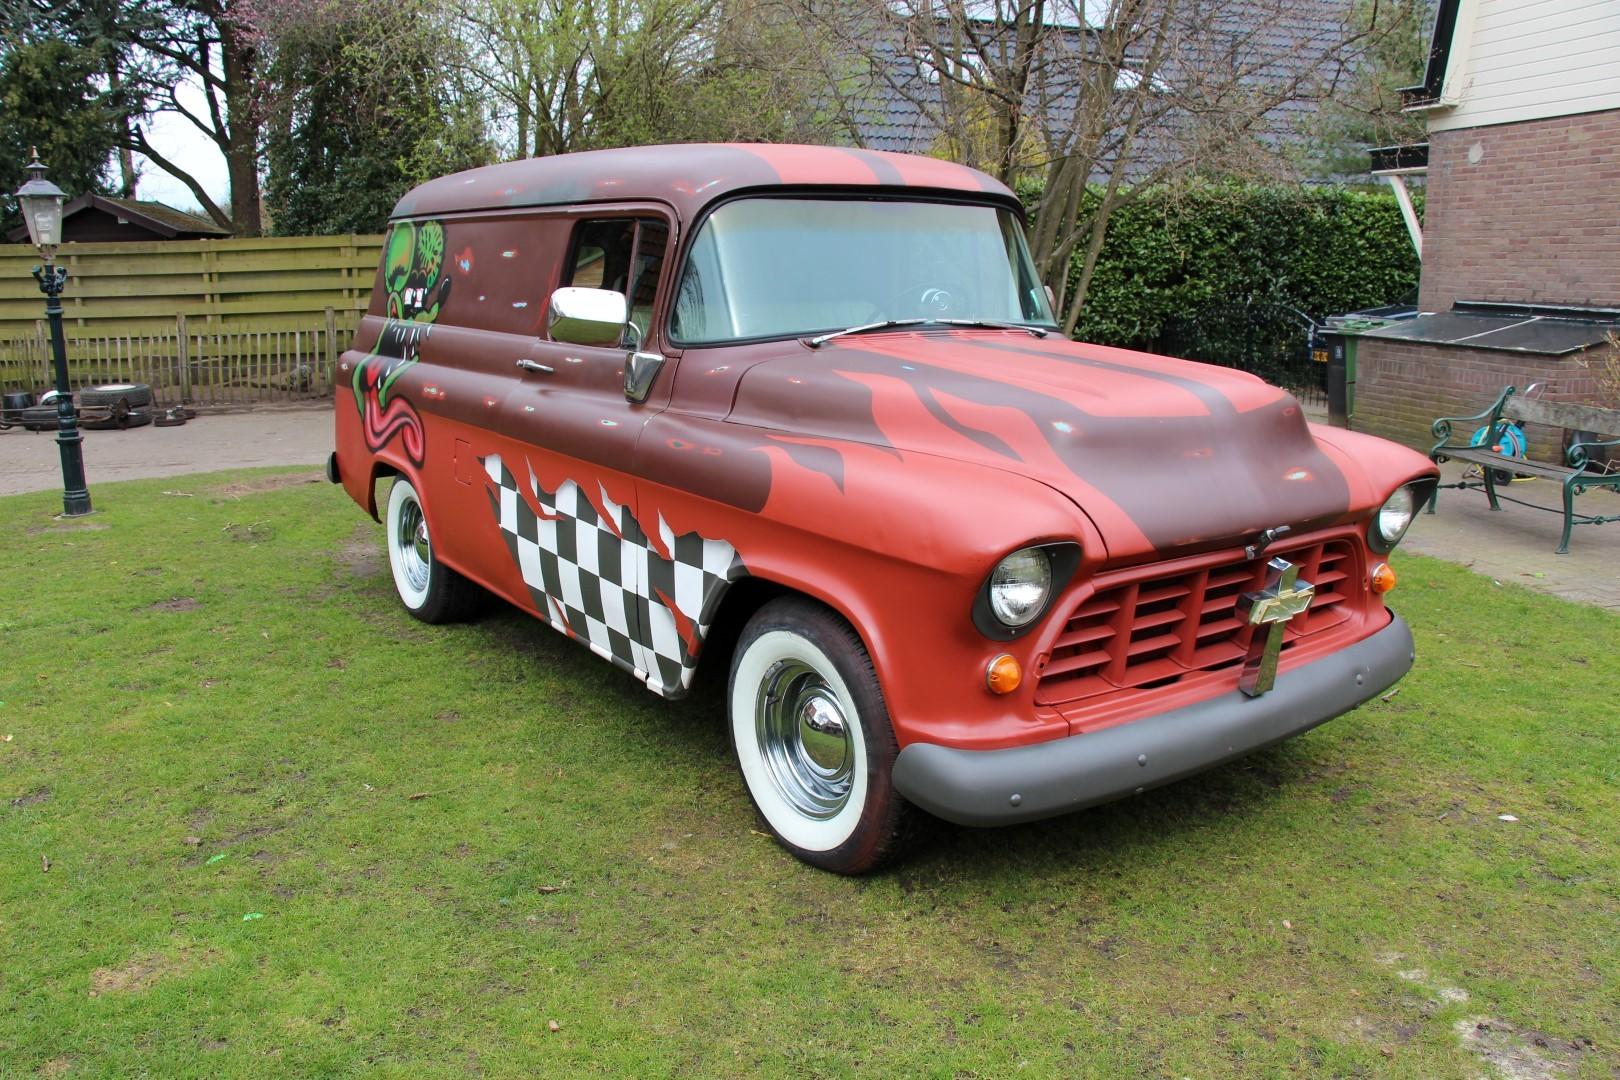 1956 Chevy Panelvan Rat Rod Speed Monkey Cars 1961 Panel Van 4